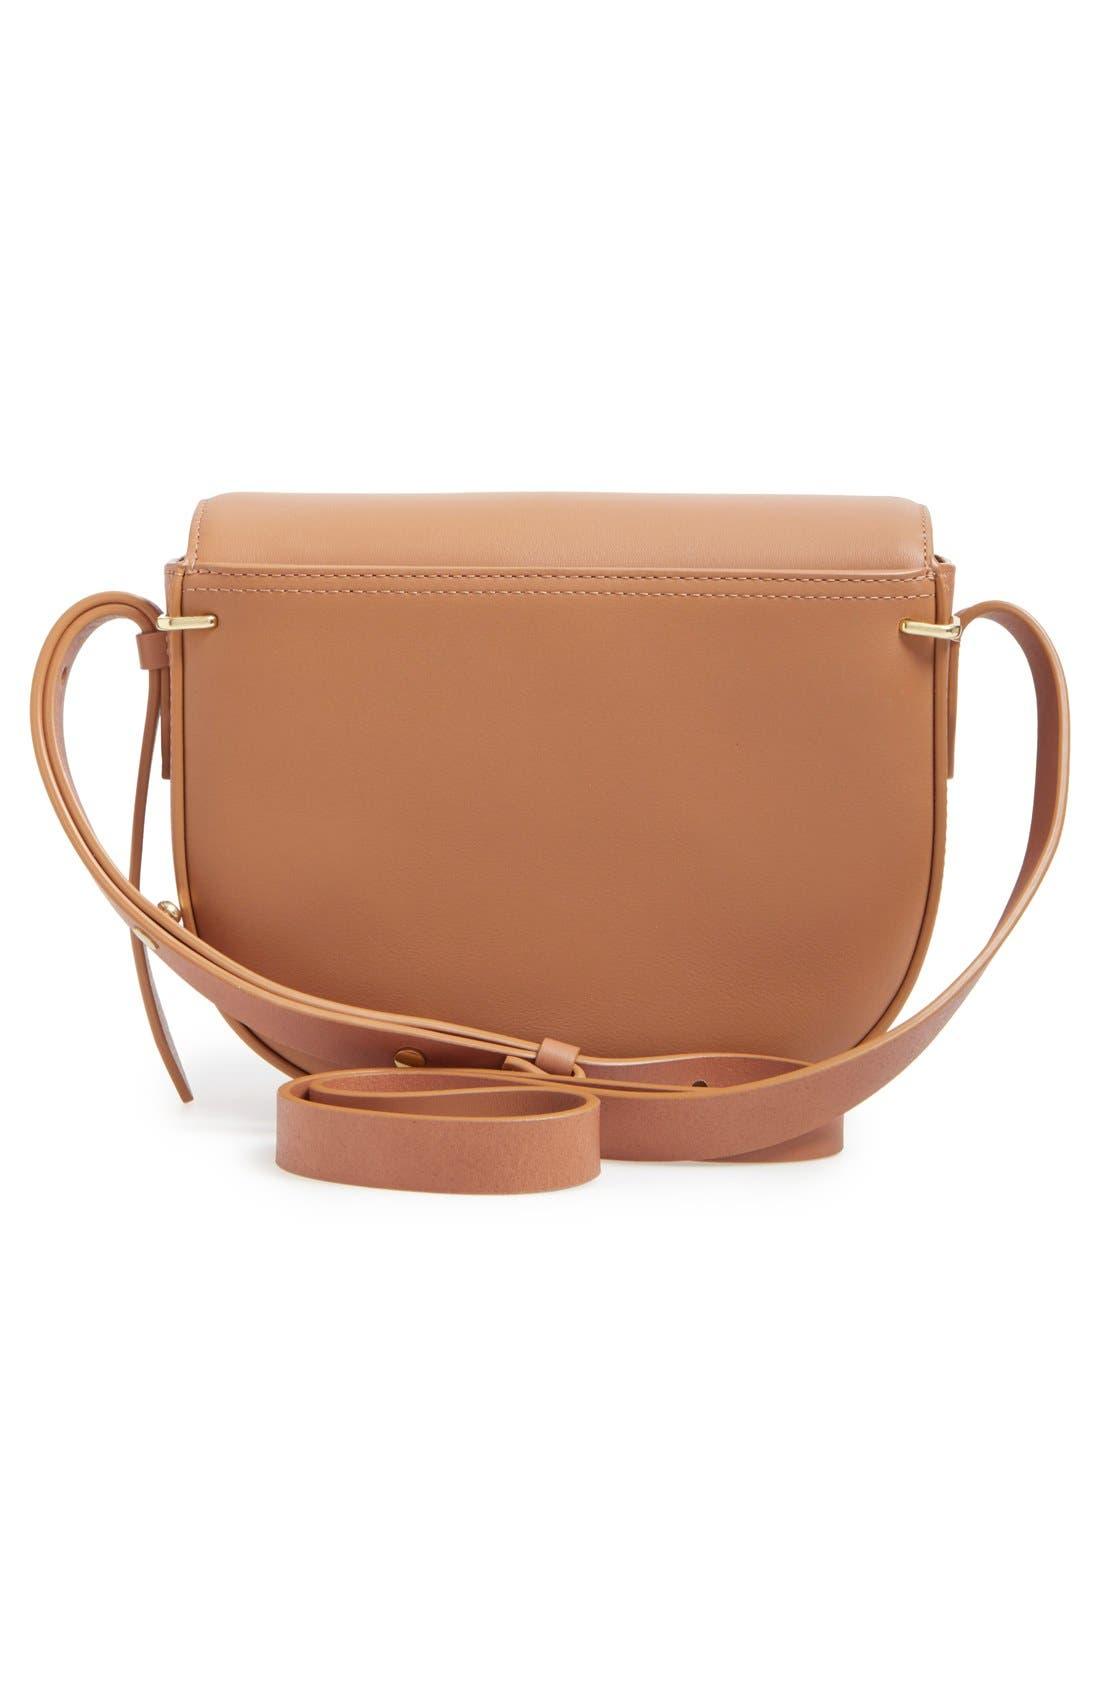 Alix Leather Saddle Bag,                             Alternate thumbnail 3, color,                             Camel